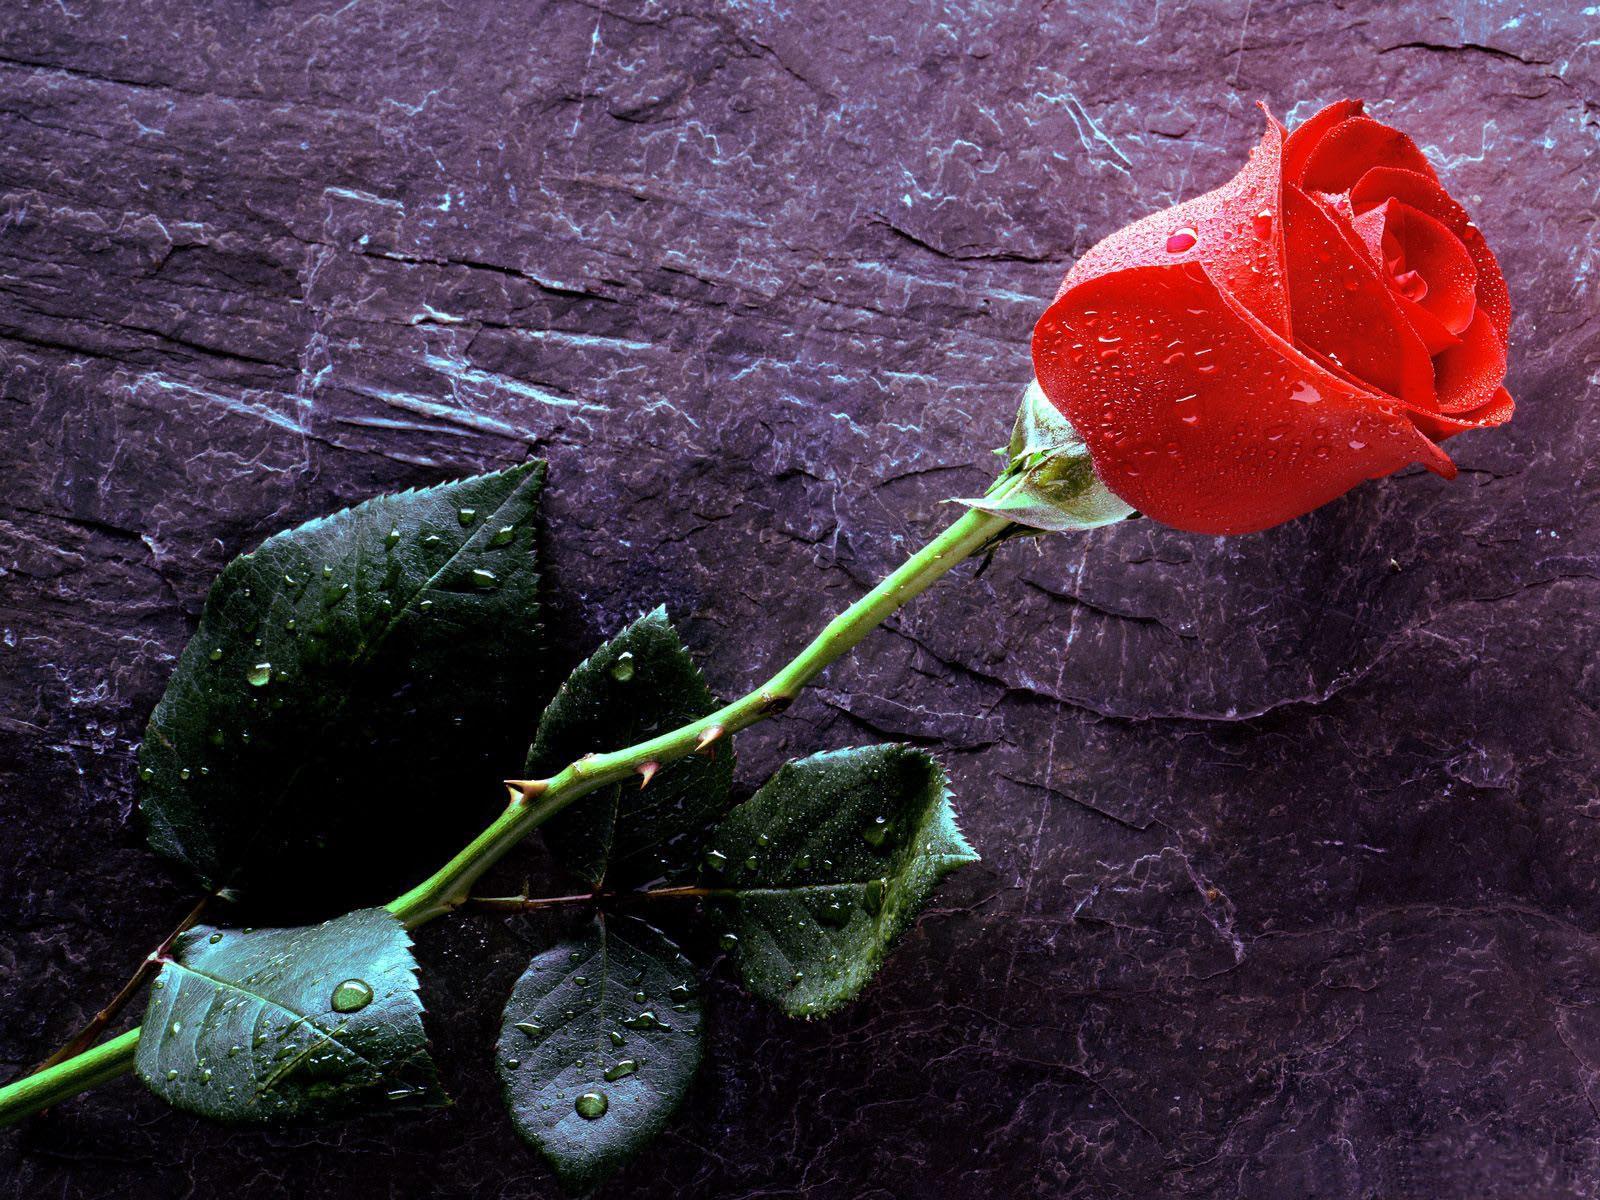 Red Rose Single Wallpaper HD